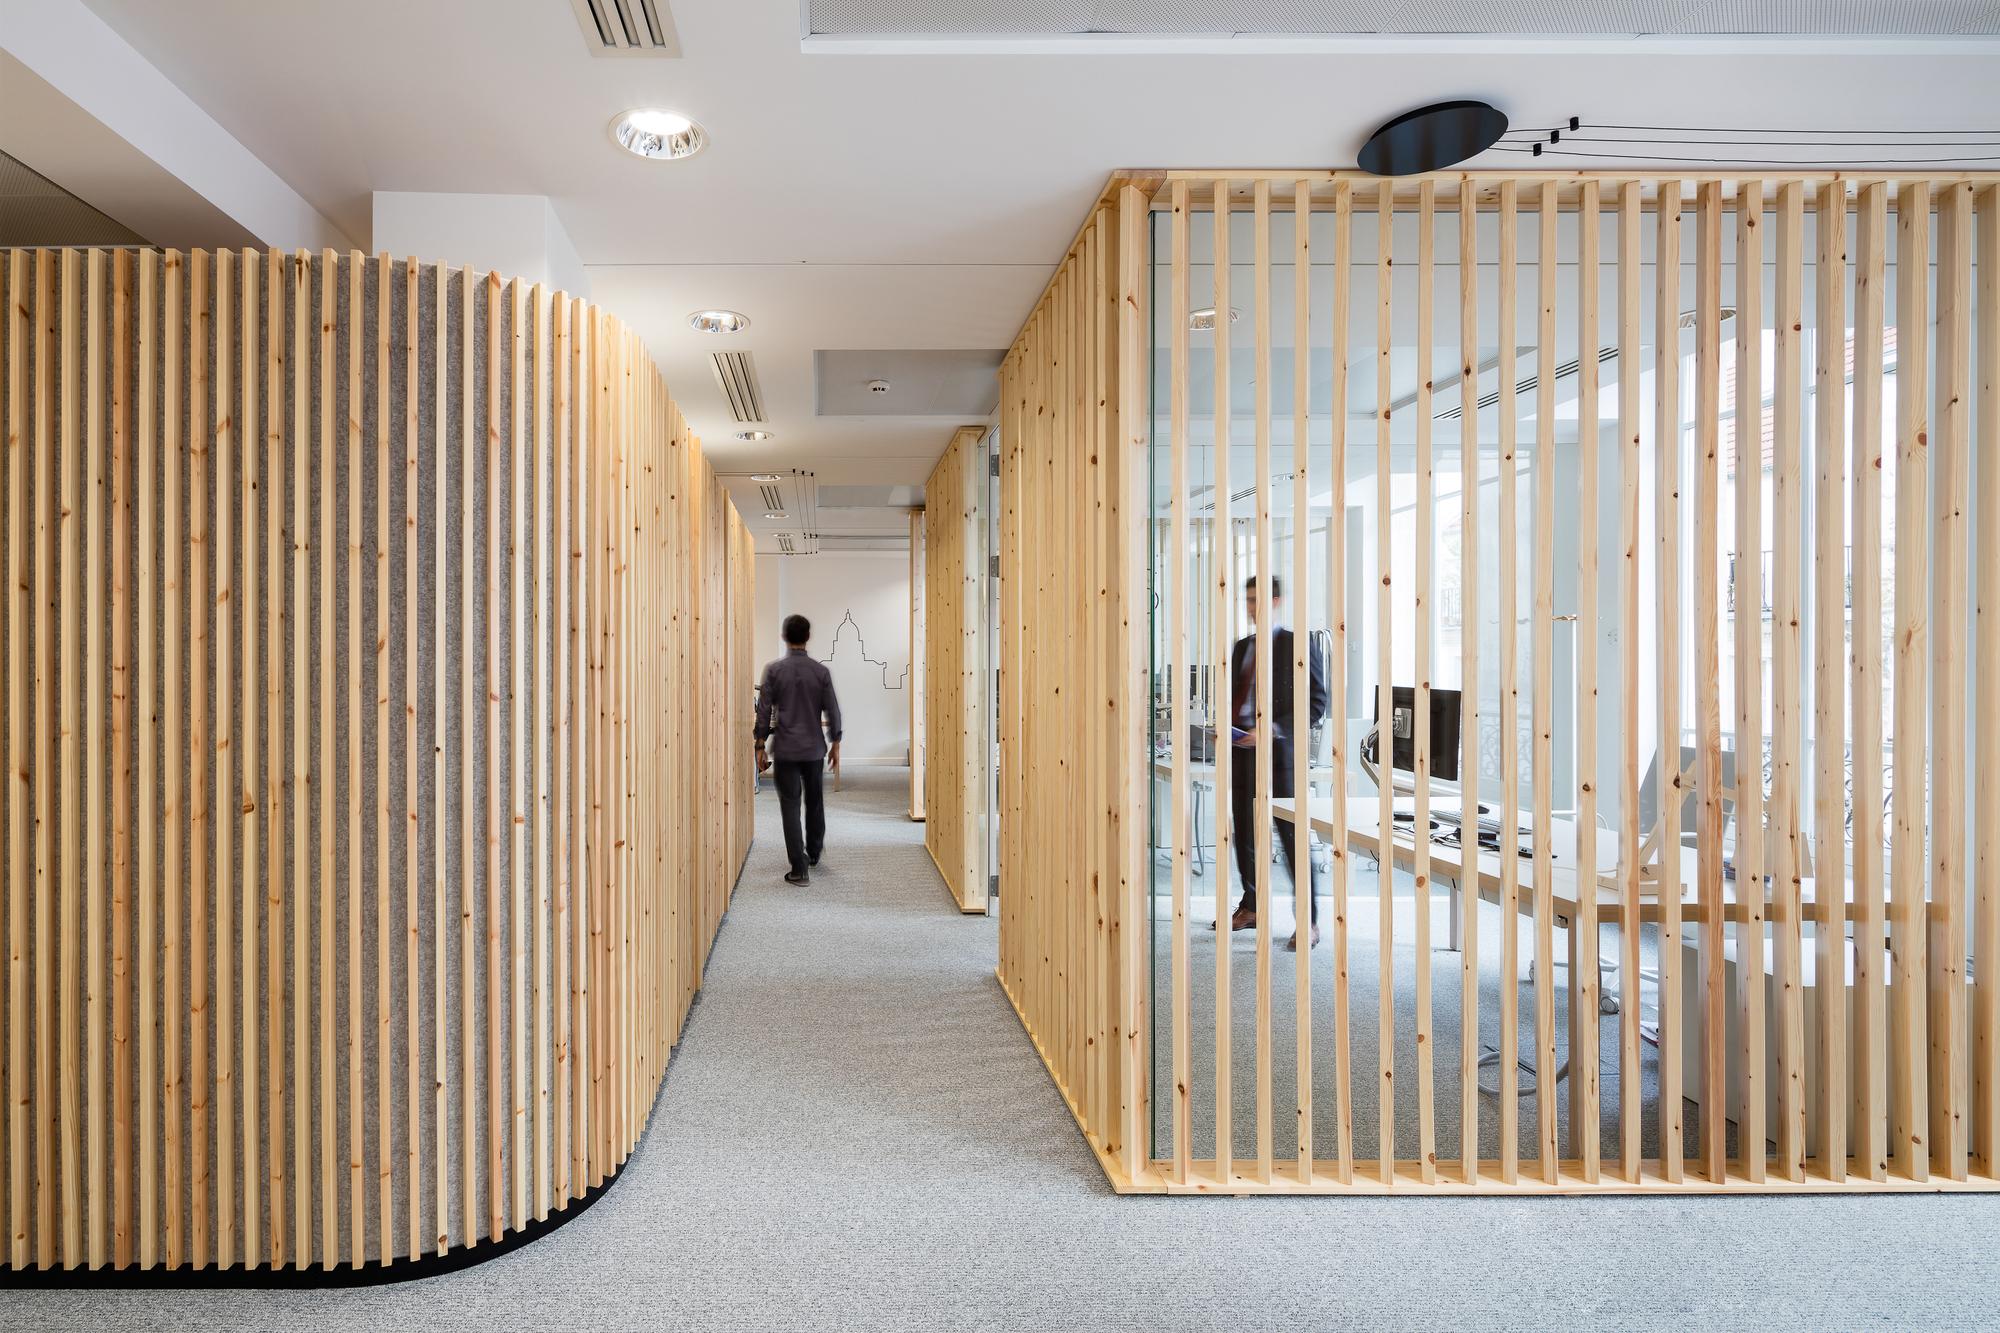 la parisienne hq studio razavi architecture archdaily. Black Bedroom Furniture Sets. Home Design Ideas